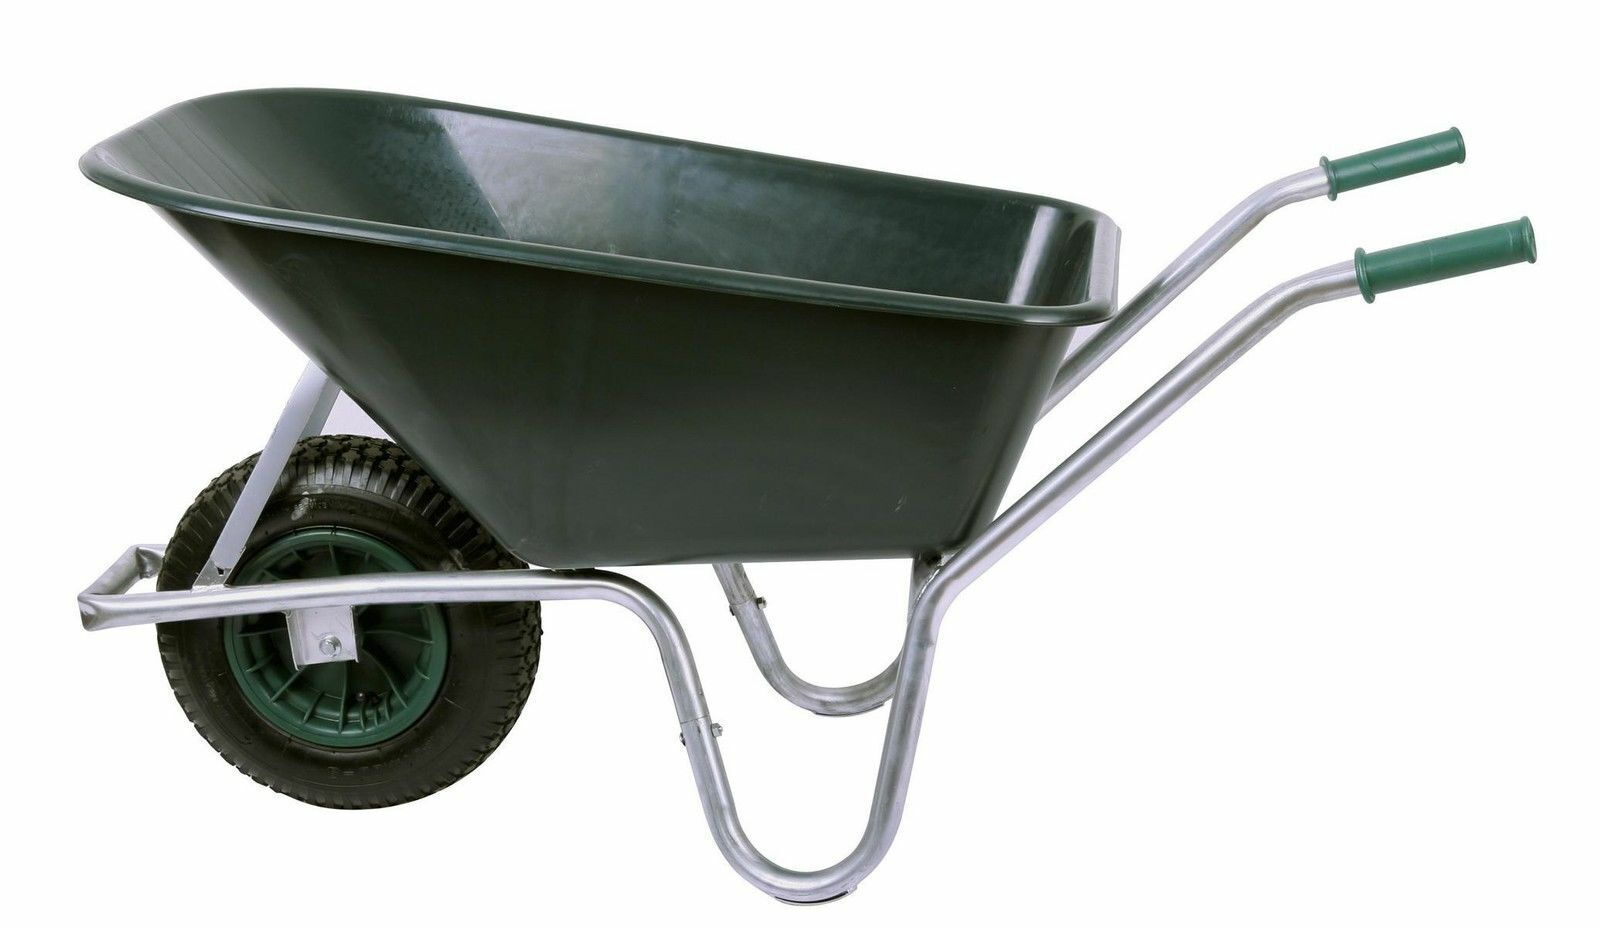 Schubkarre PROFI 100 ltr Baukarre, Bauschubkarre, Gartenkarre verzinkt 250kg